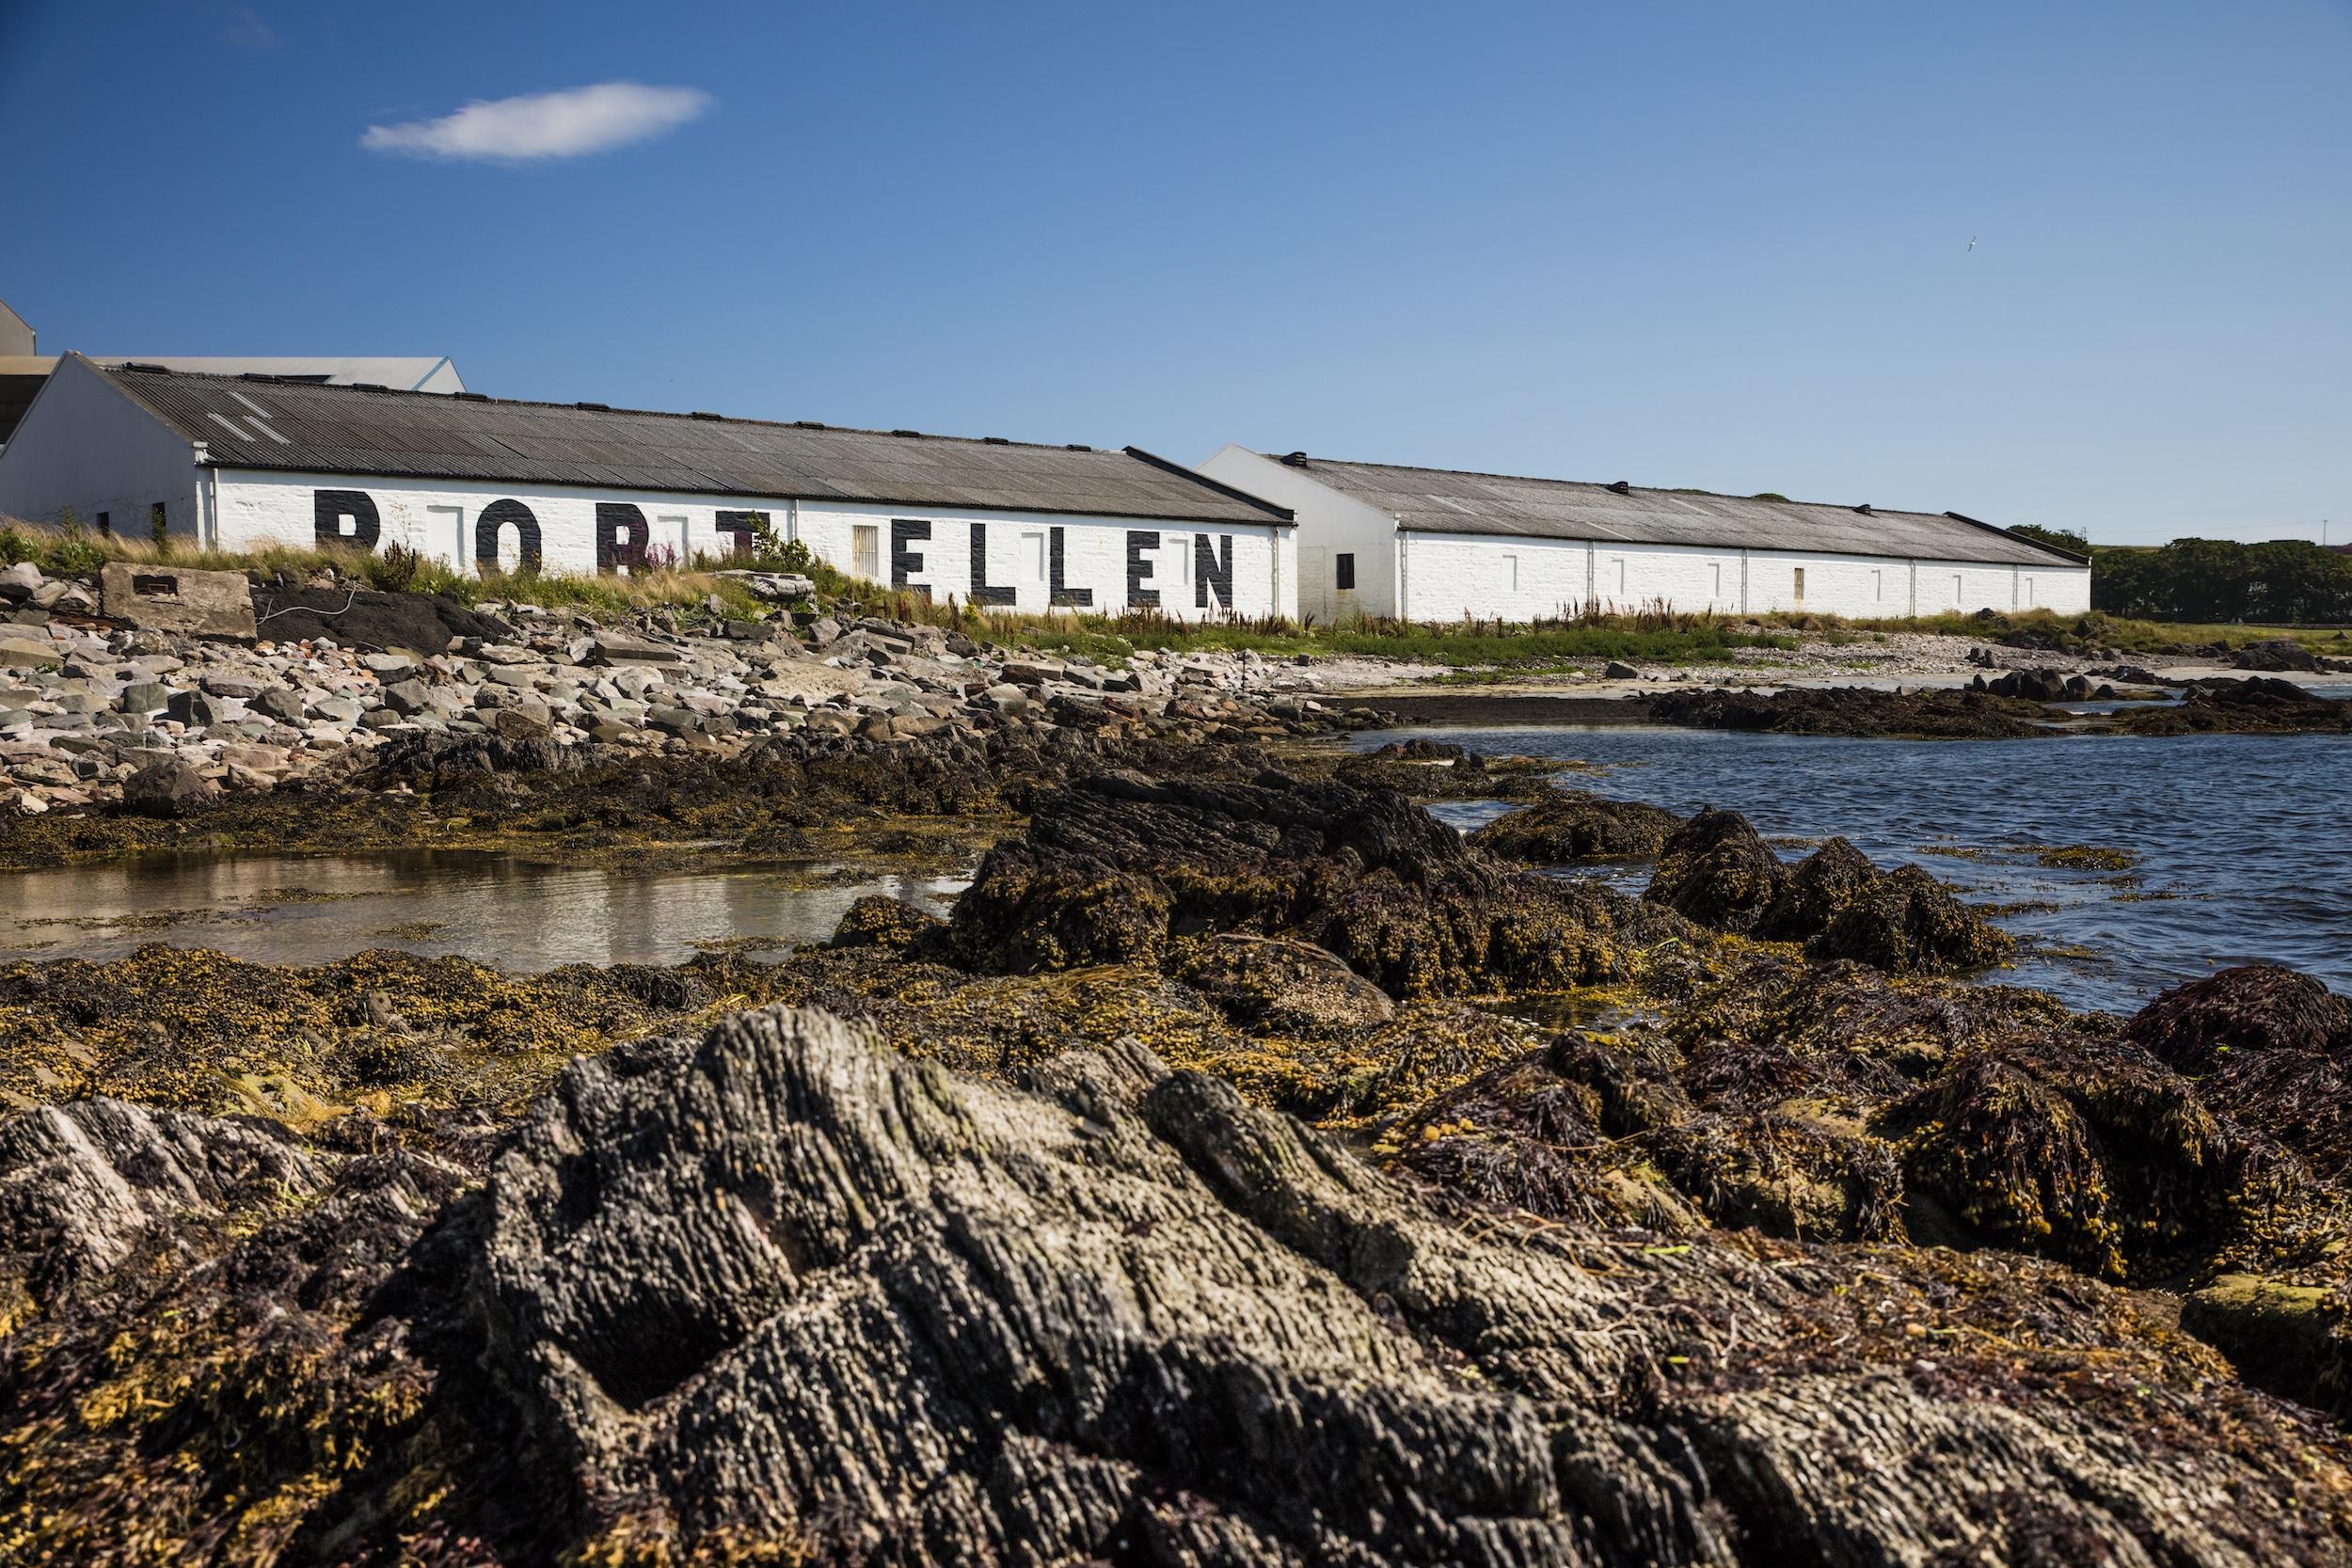 Behind Johnnie Walker's ghost distilleries and their ultra-rare Scotch whiskies